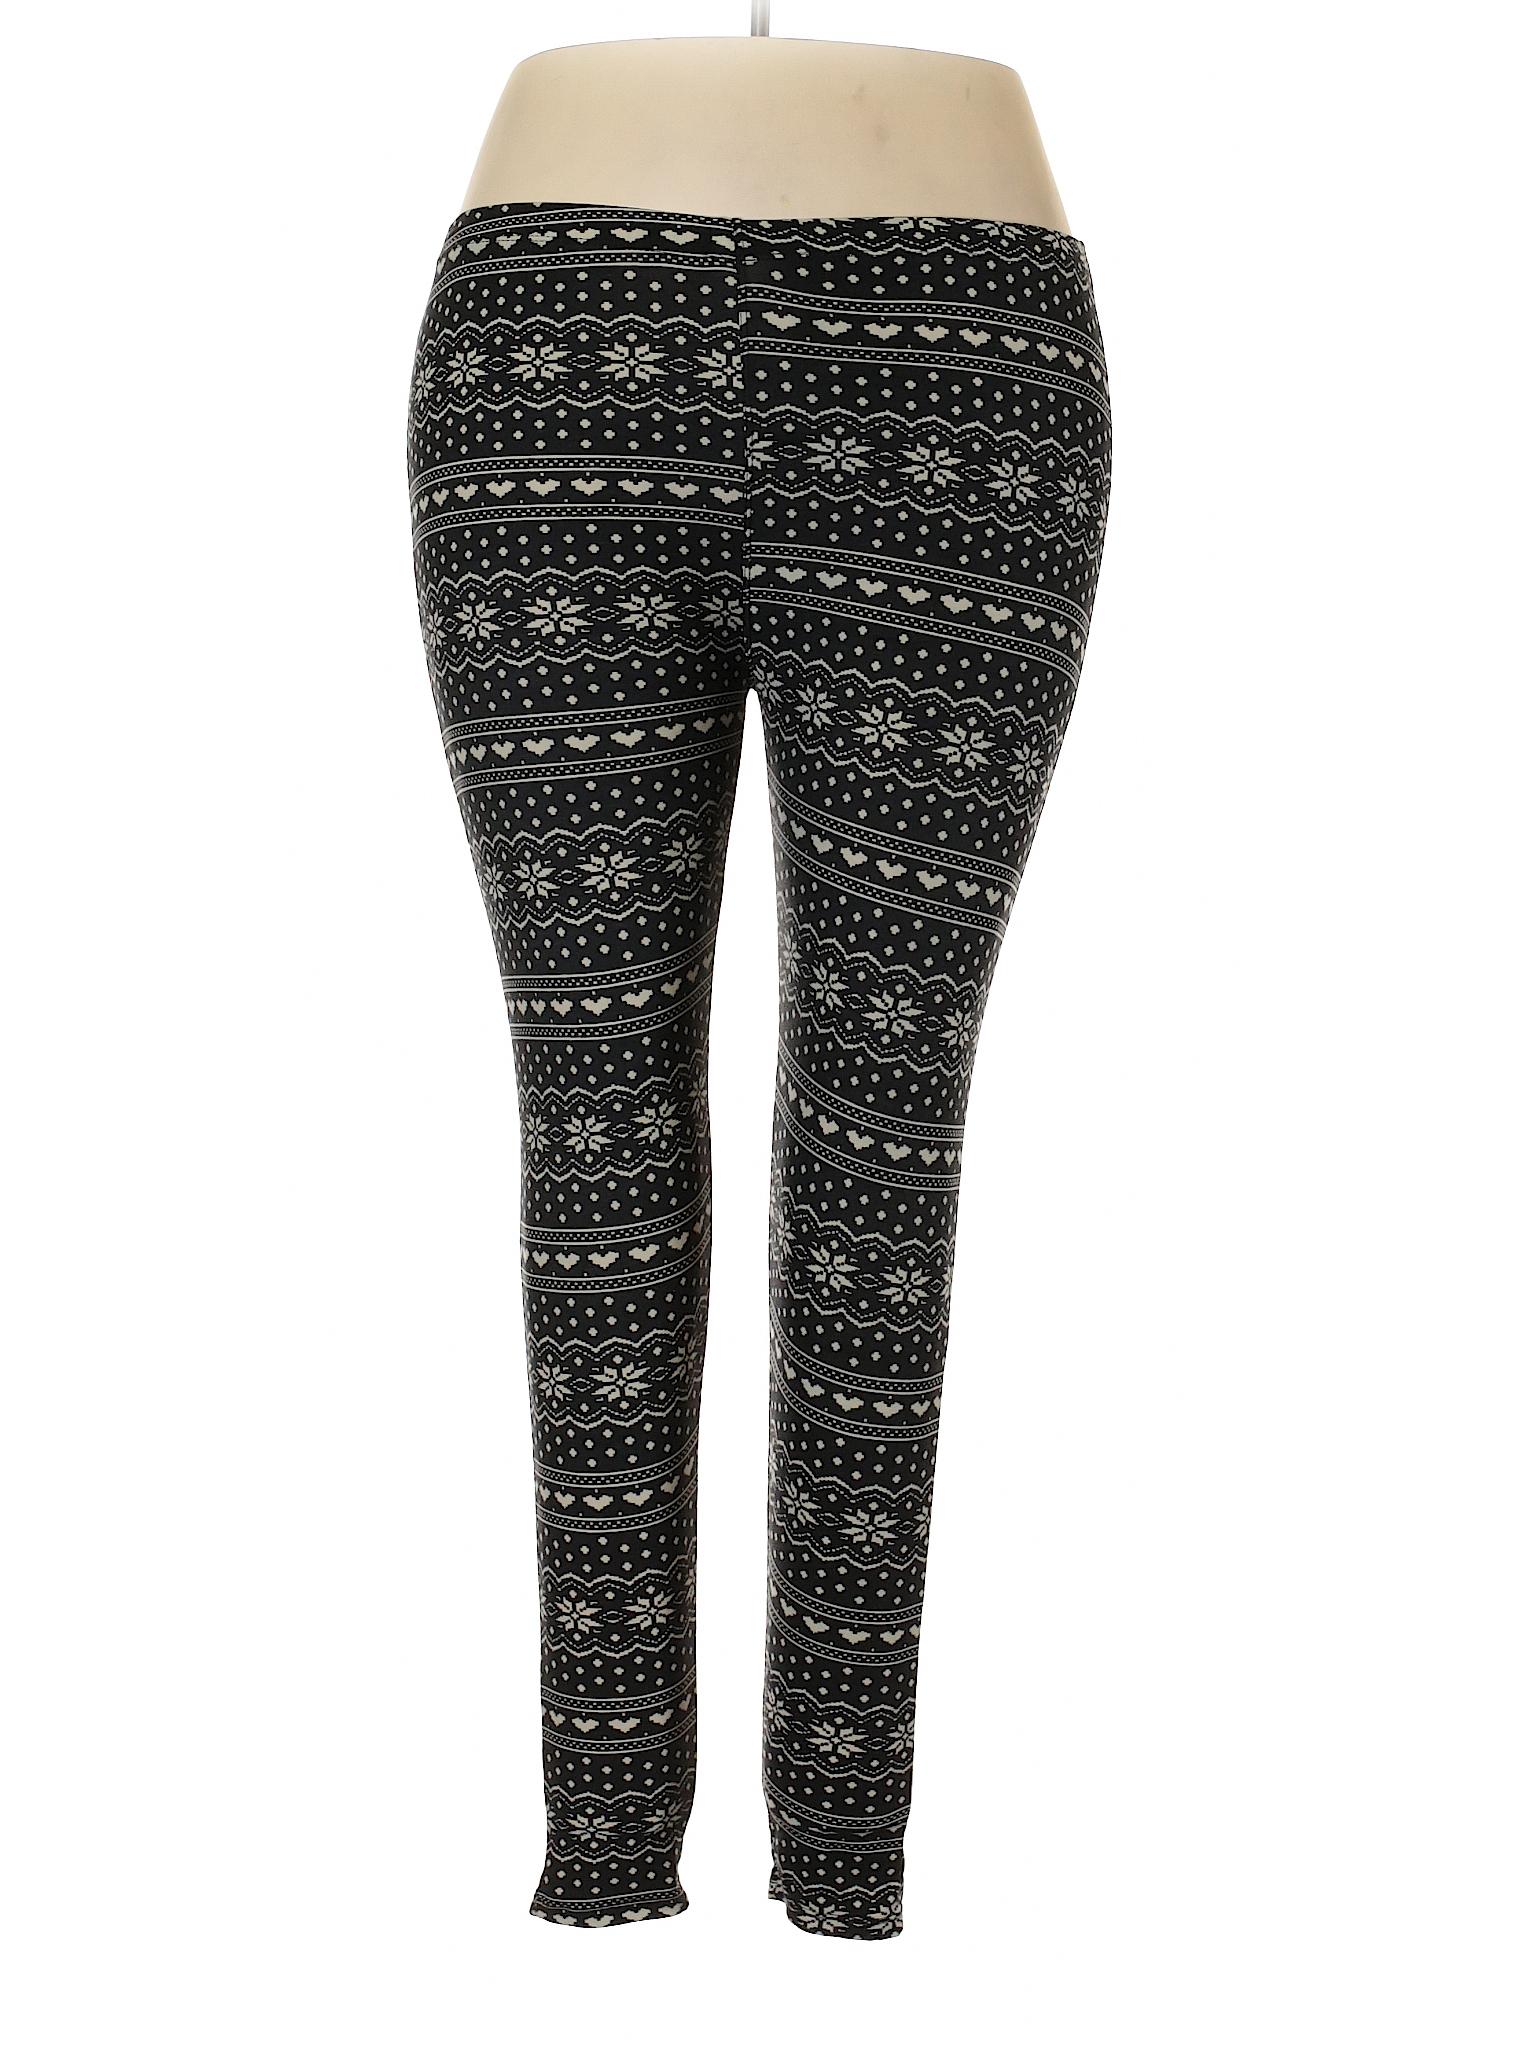 d2bf0c8229ef9e Merona Print Black Leggings Size Plus Size - 41% off | thredUP